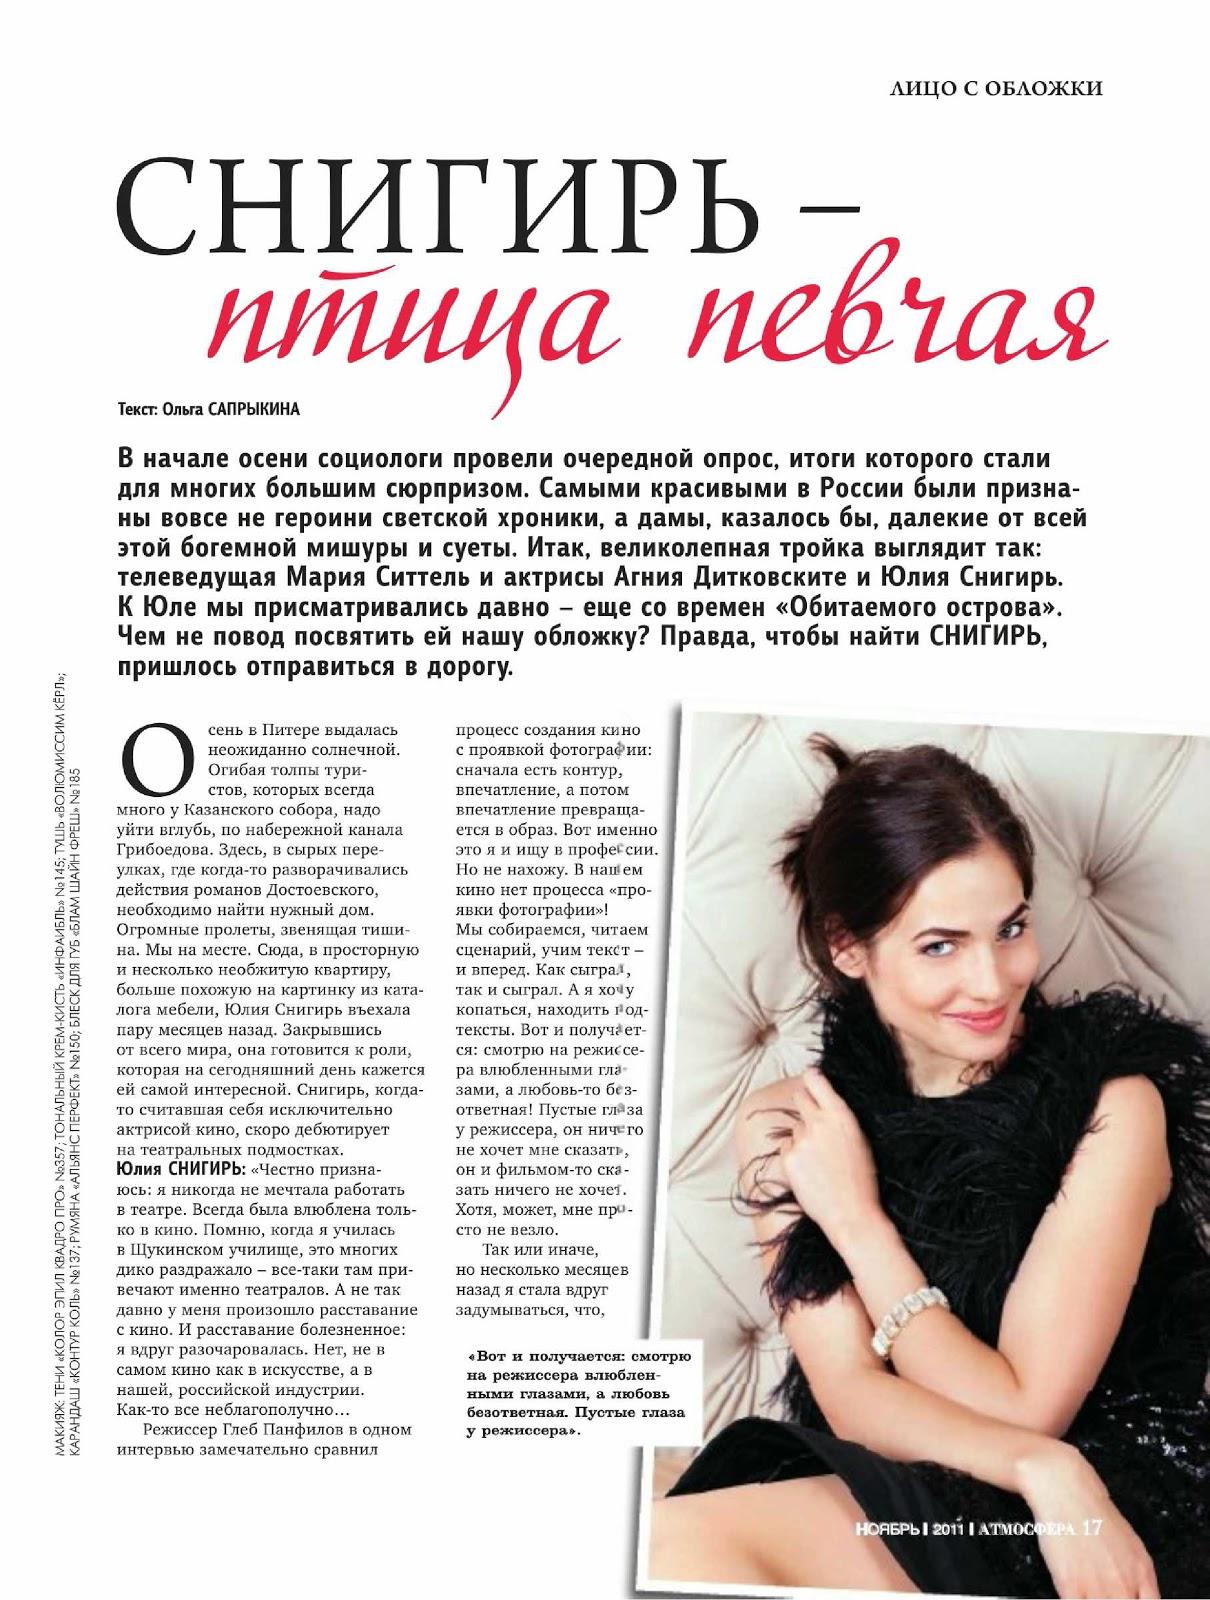 Юлия зимина фото в журнале 29 фотография